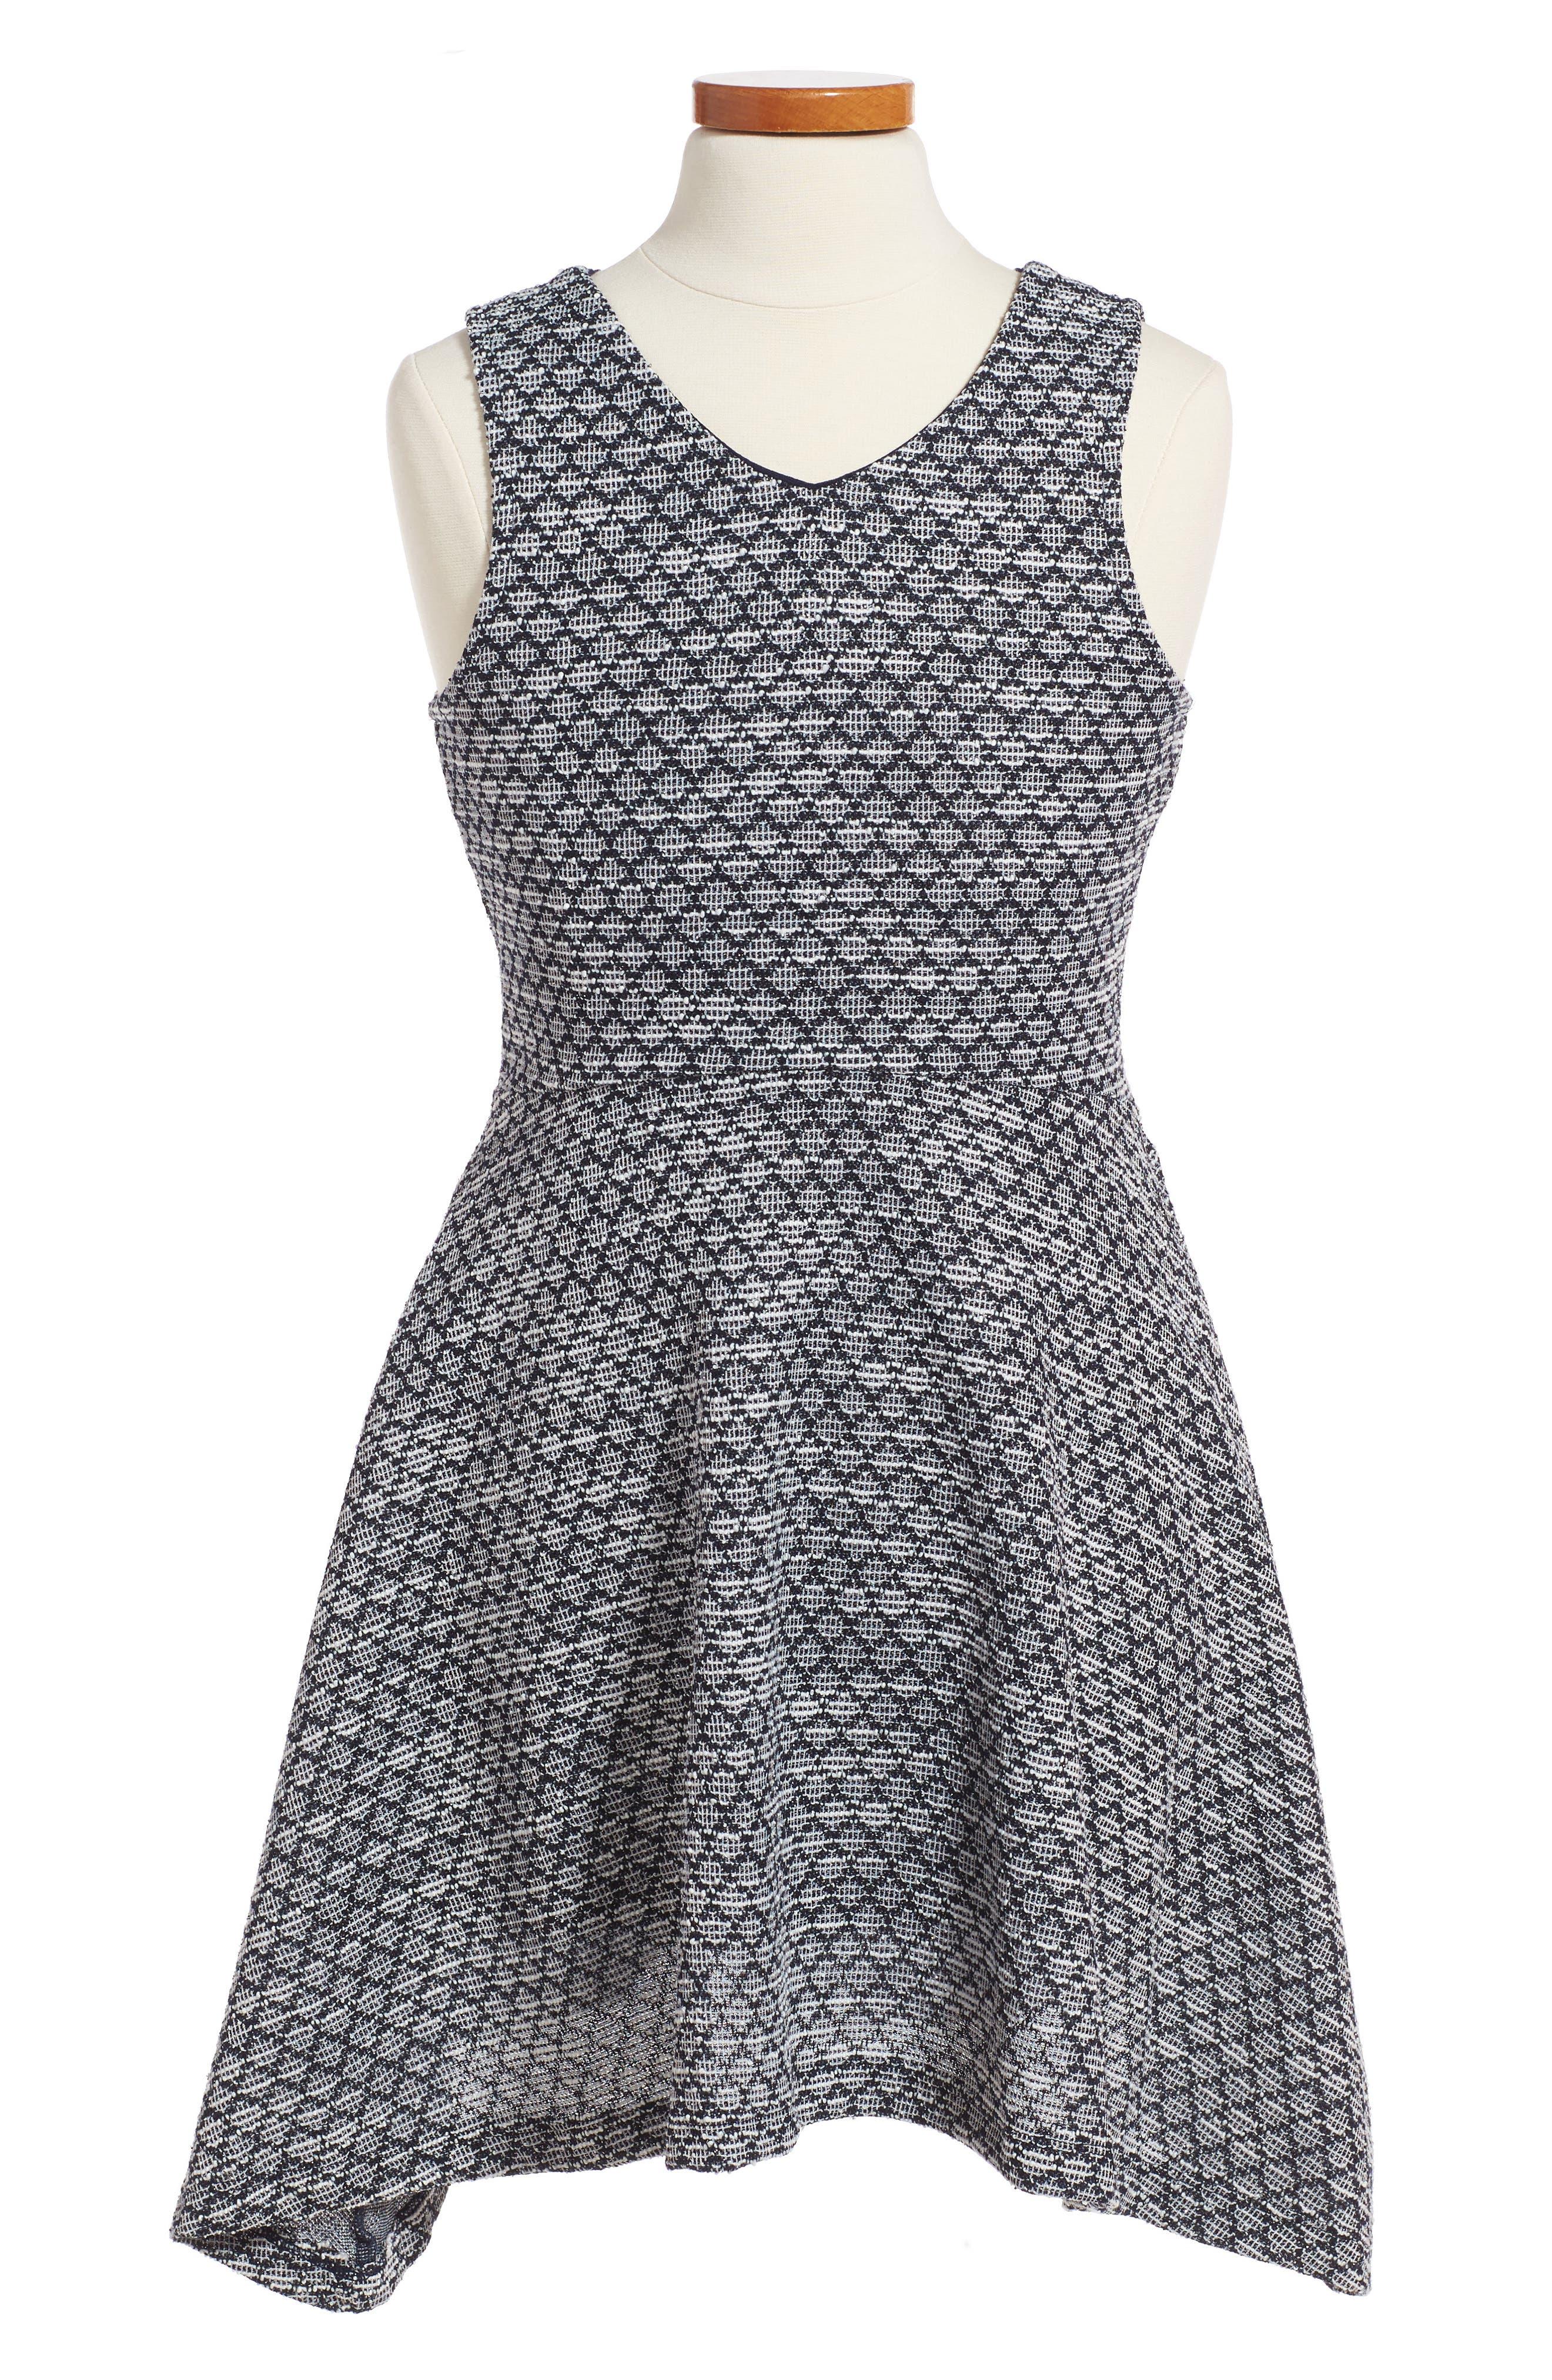 Lolita Sleeveless Skater Dress,                             Main thumbnail 1, color,                             410